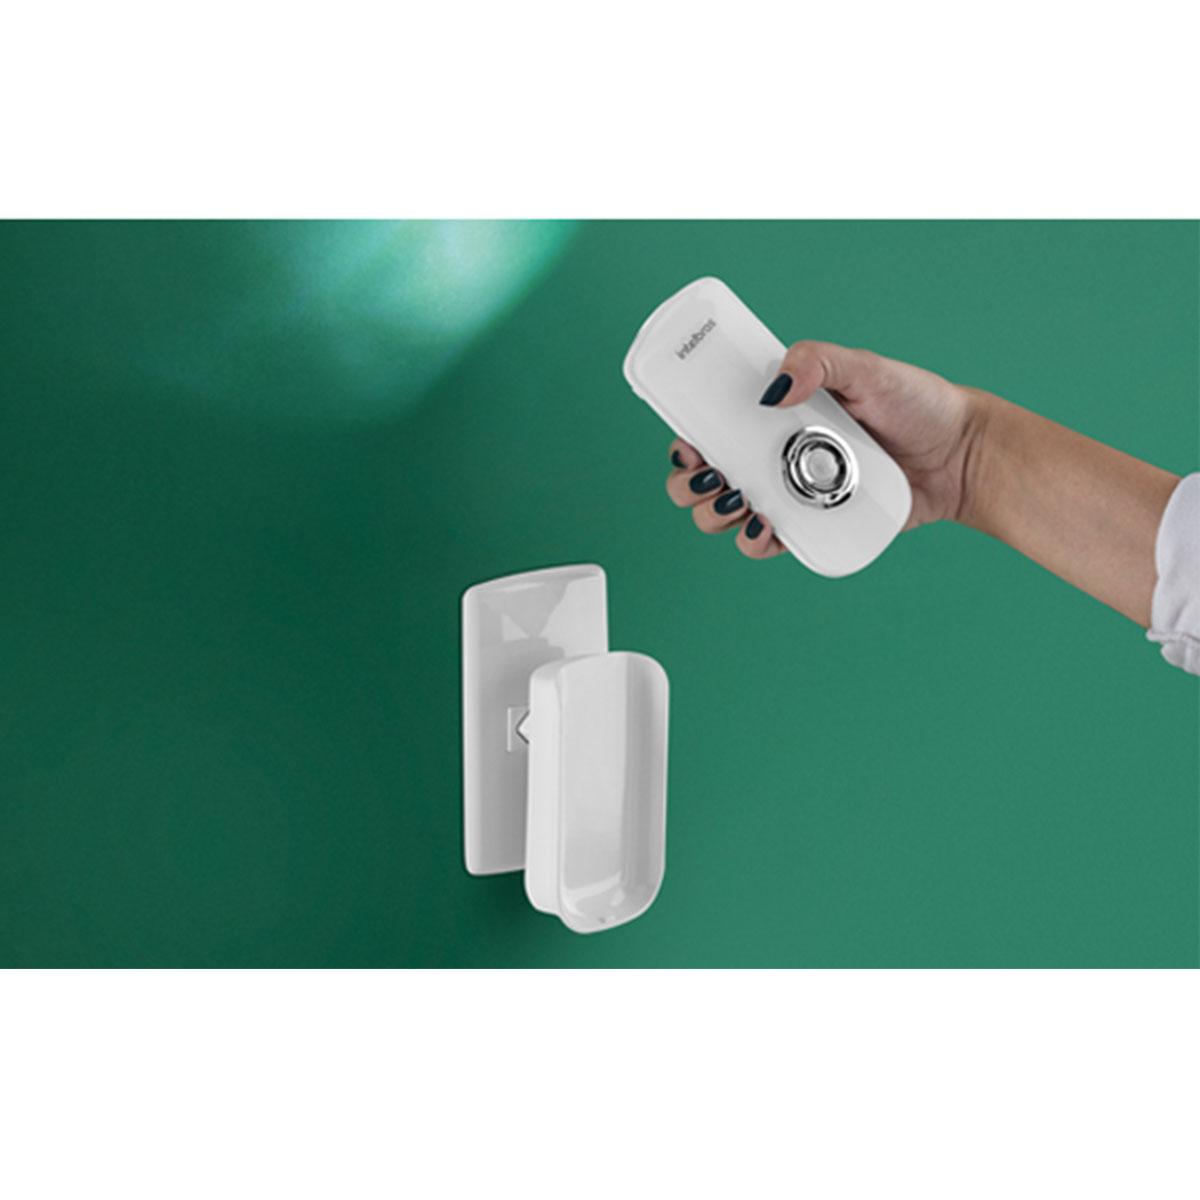 Kit 2 Luminária Intelbras Led c/ Sensor De Presença Esi 5003